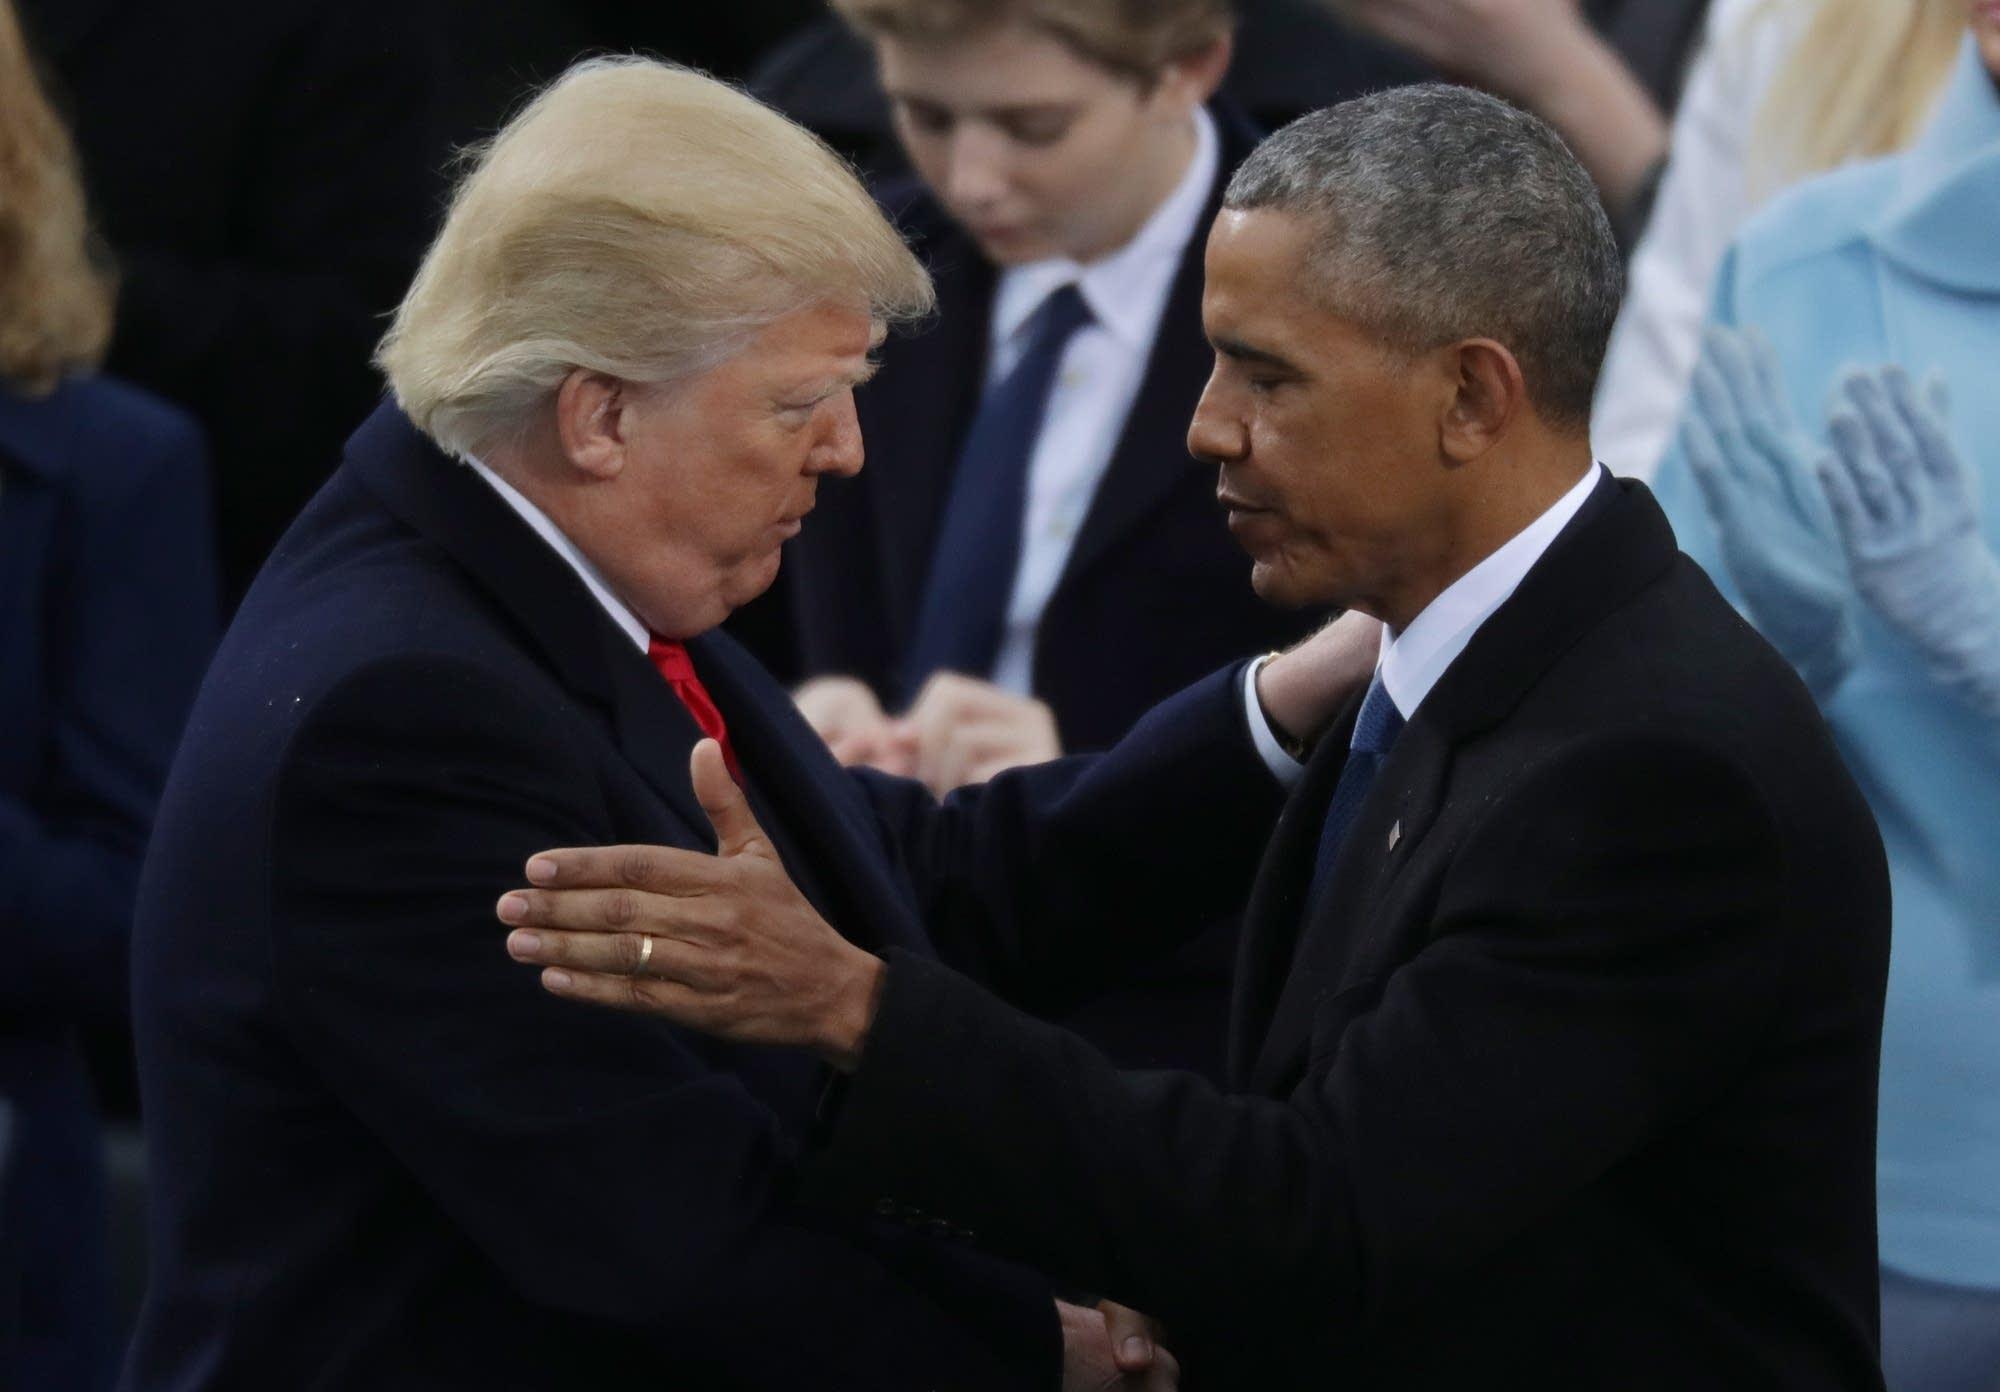 Former President Barack Obama congratulates President Donald Trump.